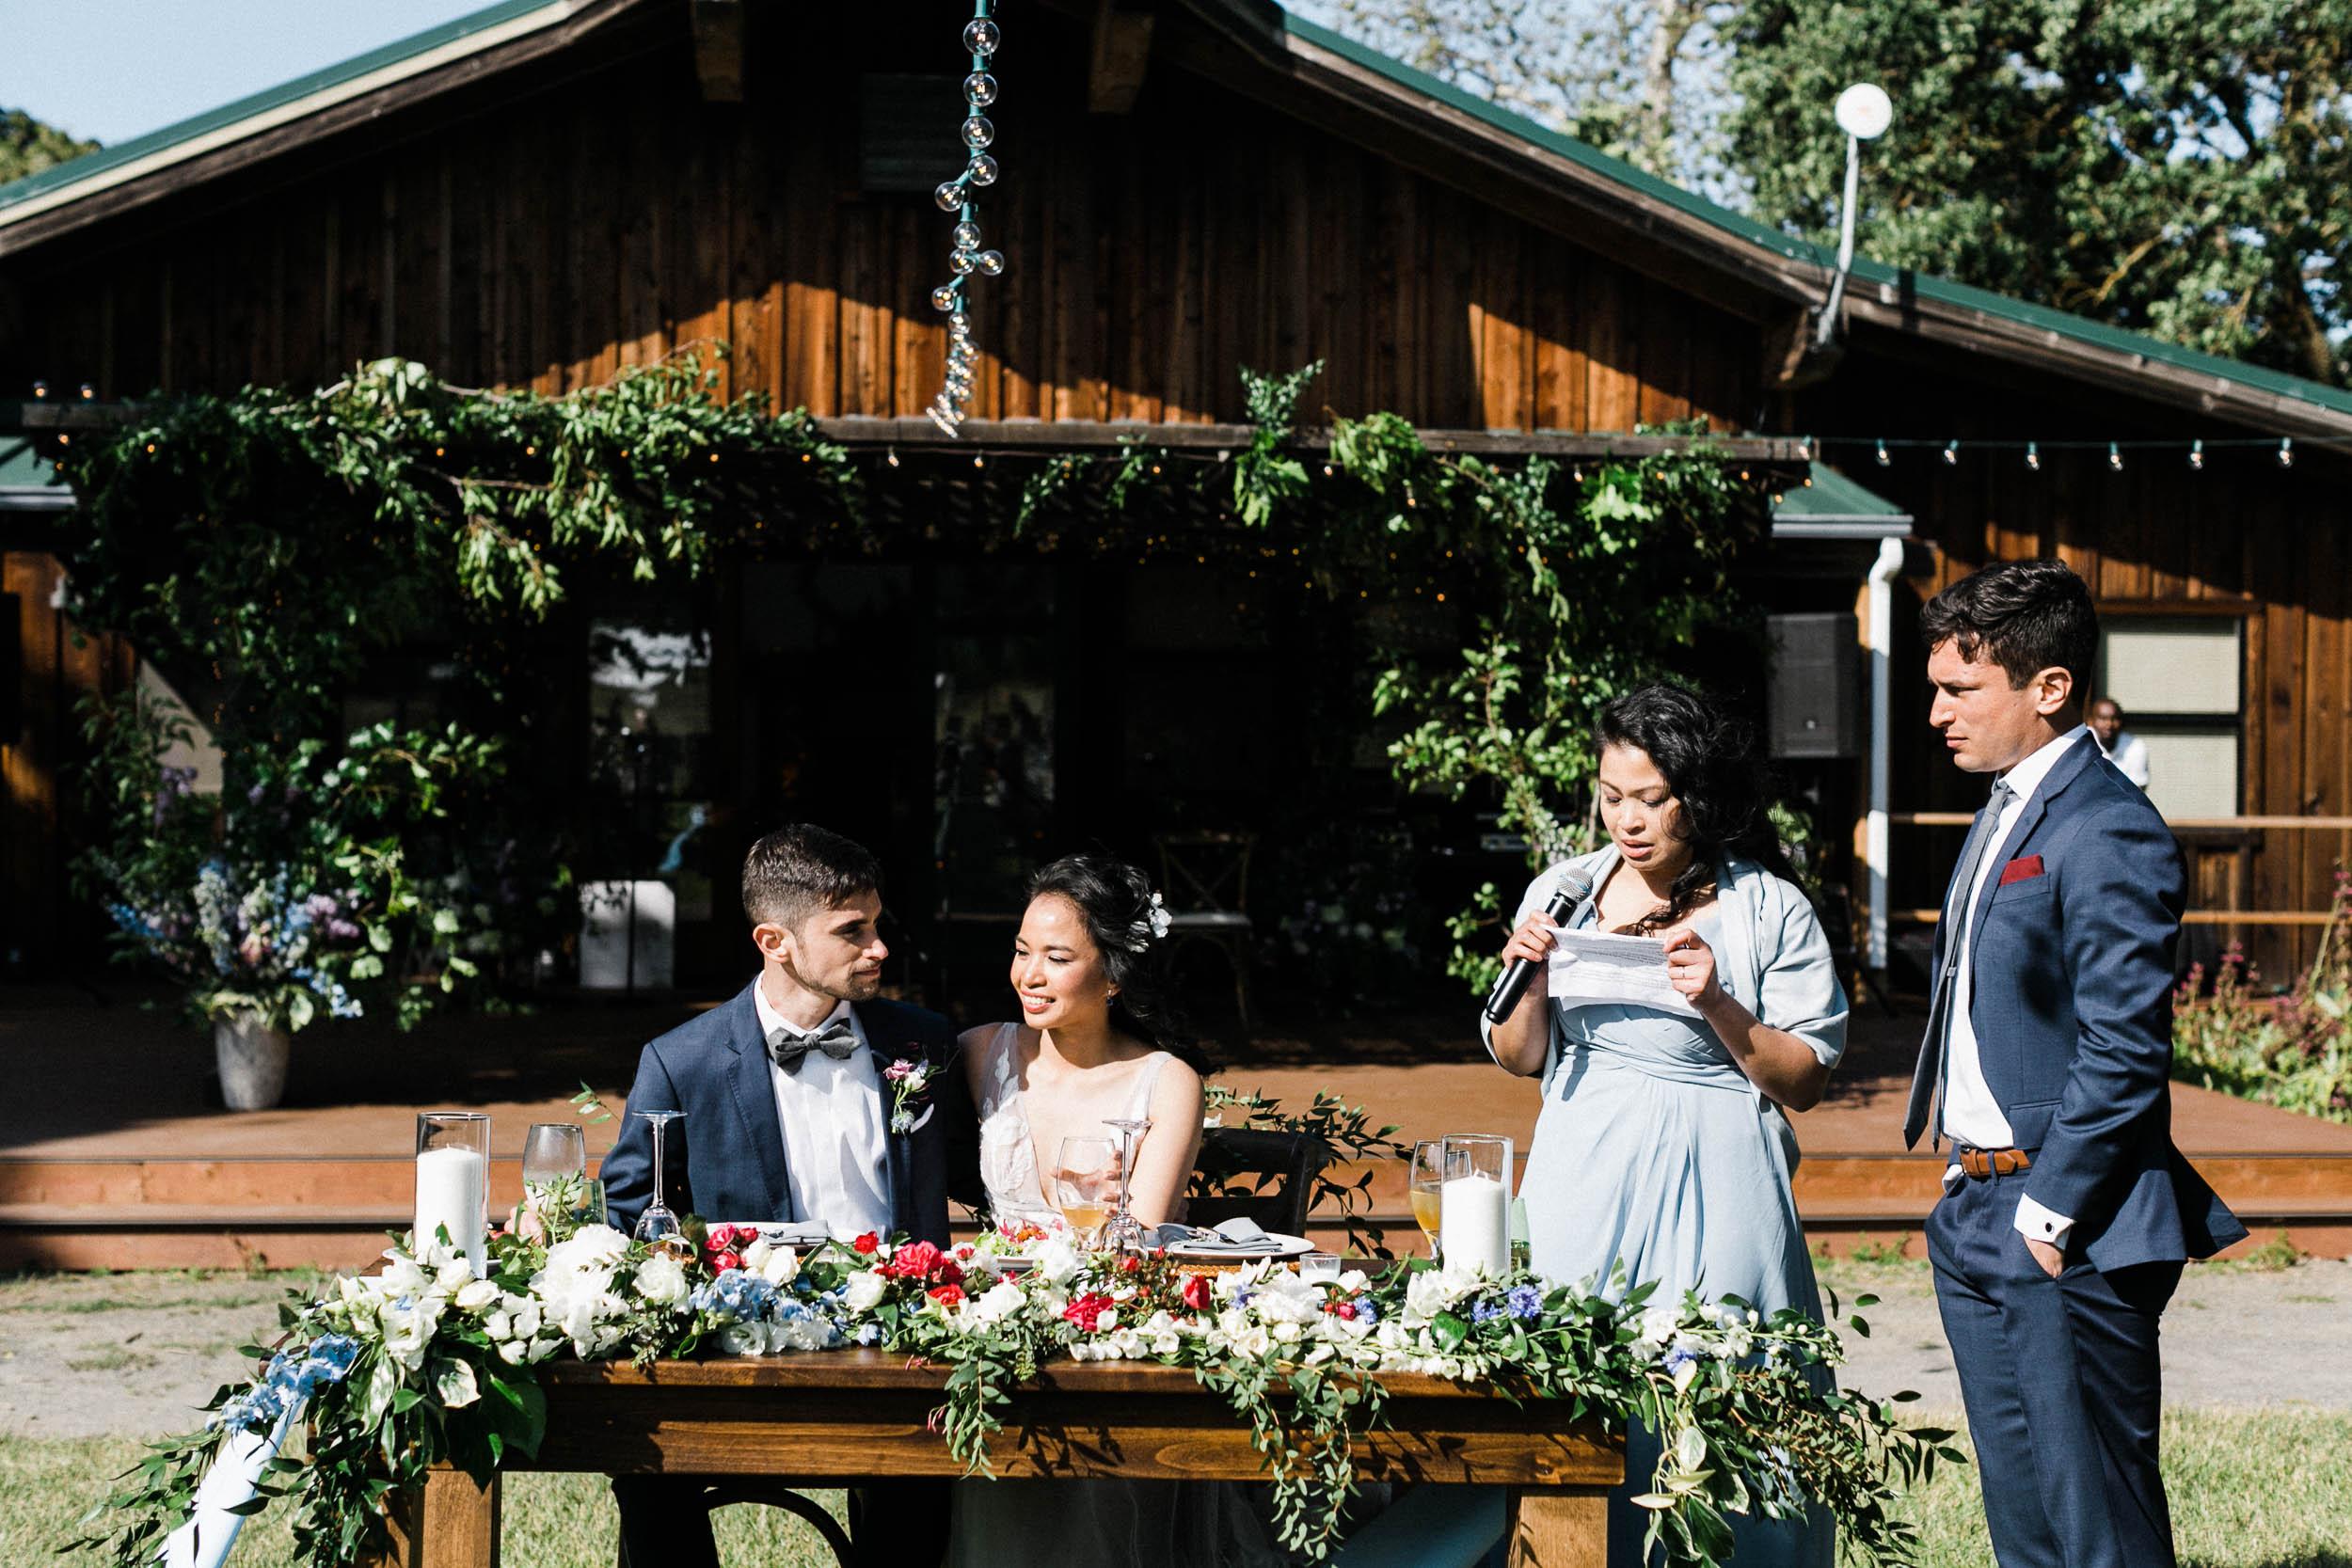 052519_B+S_Hidden Villa Wedding_Buena Lane Photography_052519_0712CY.jpg